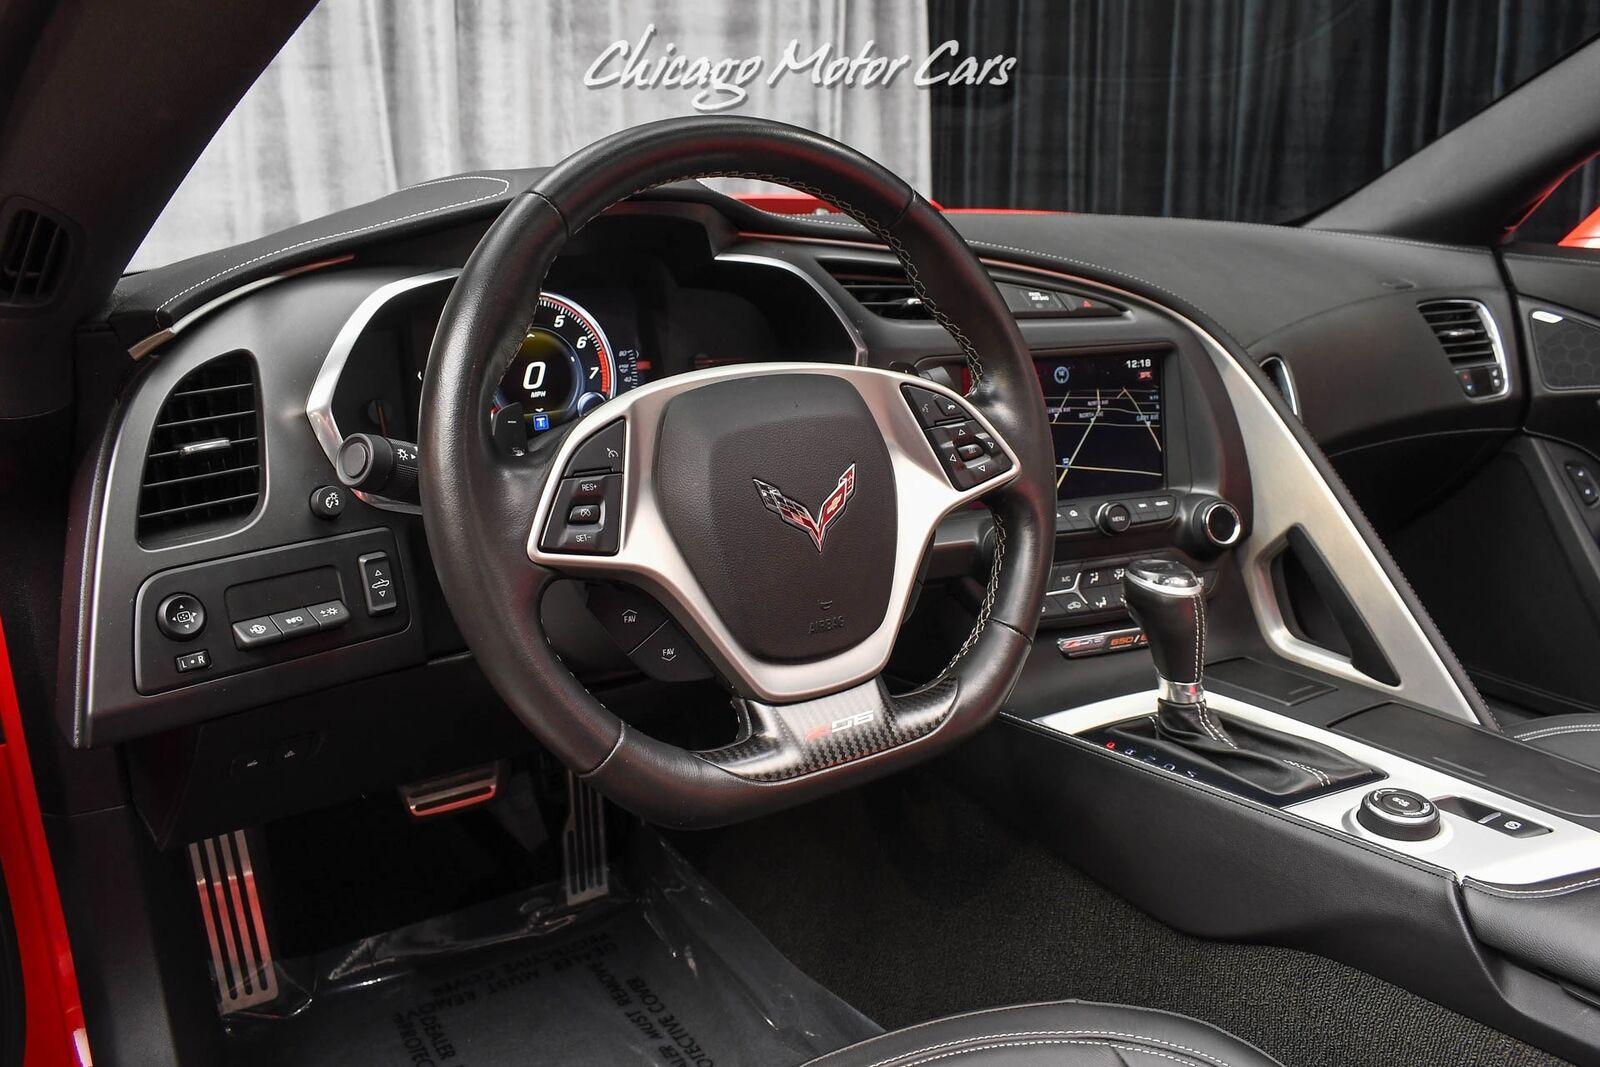 2015 Red Chevrolet Corvette Z06 2LZ | C7 Corvette Photo 8